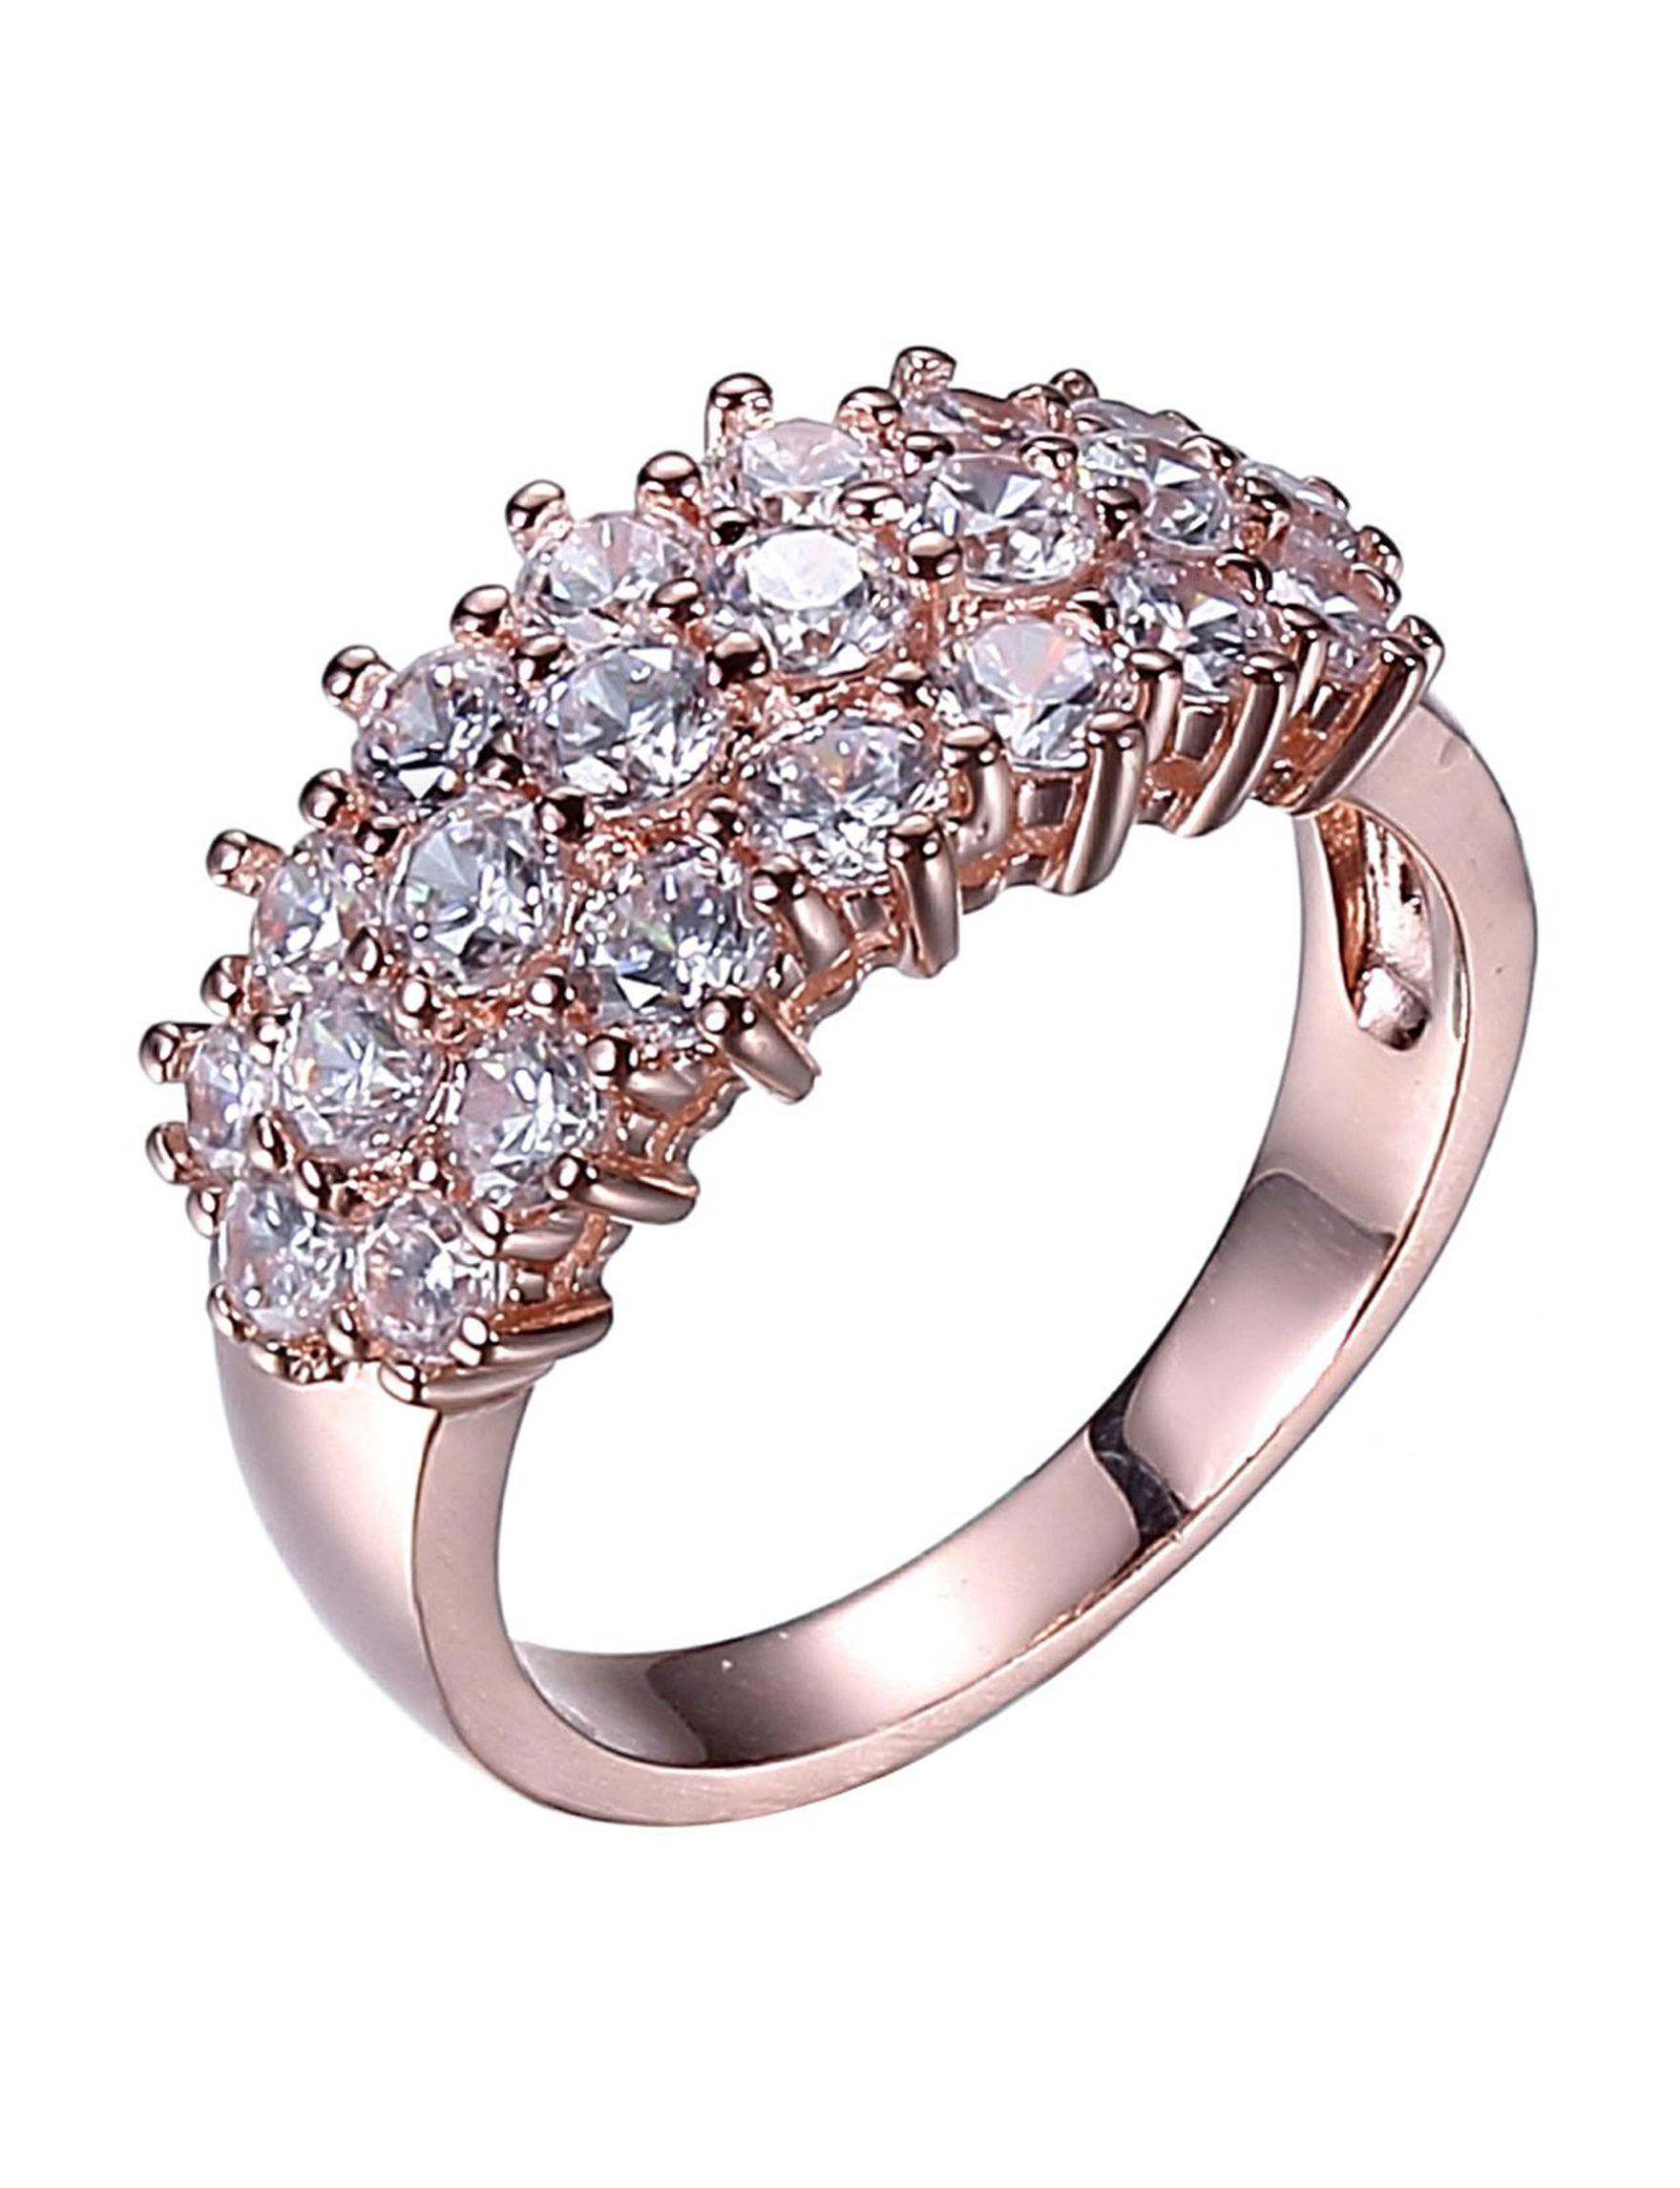 PAJ INC. Rose Gold Rings Fine Jewelry